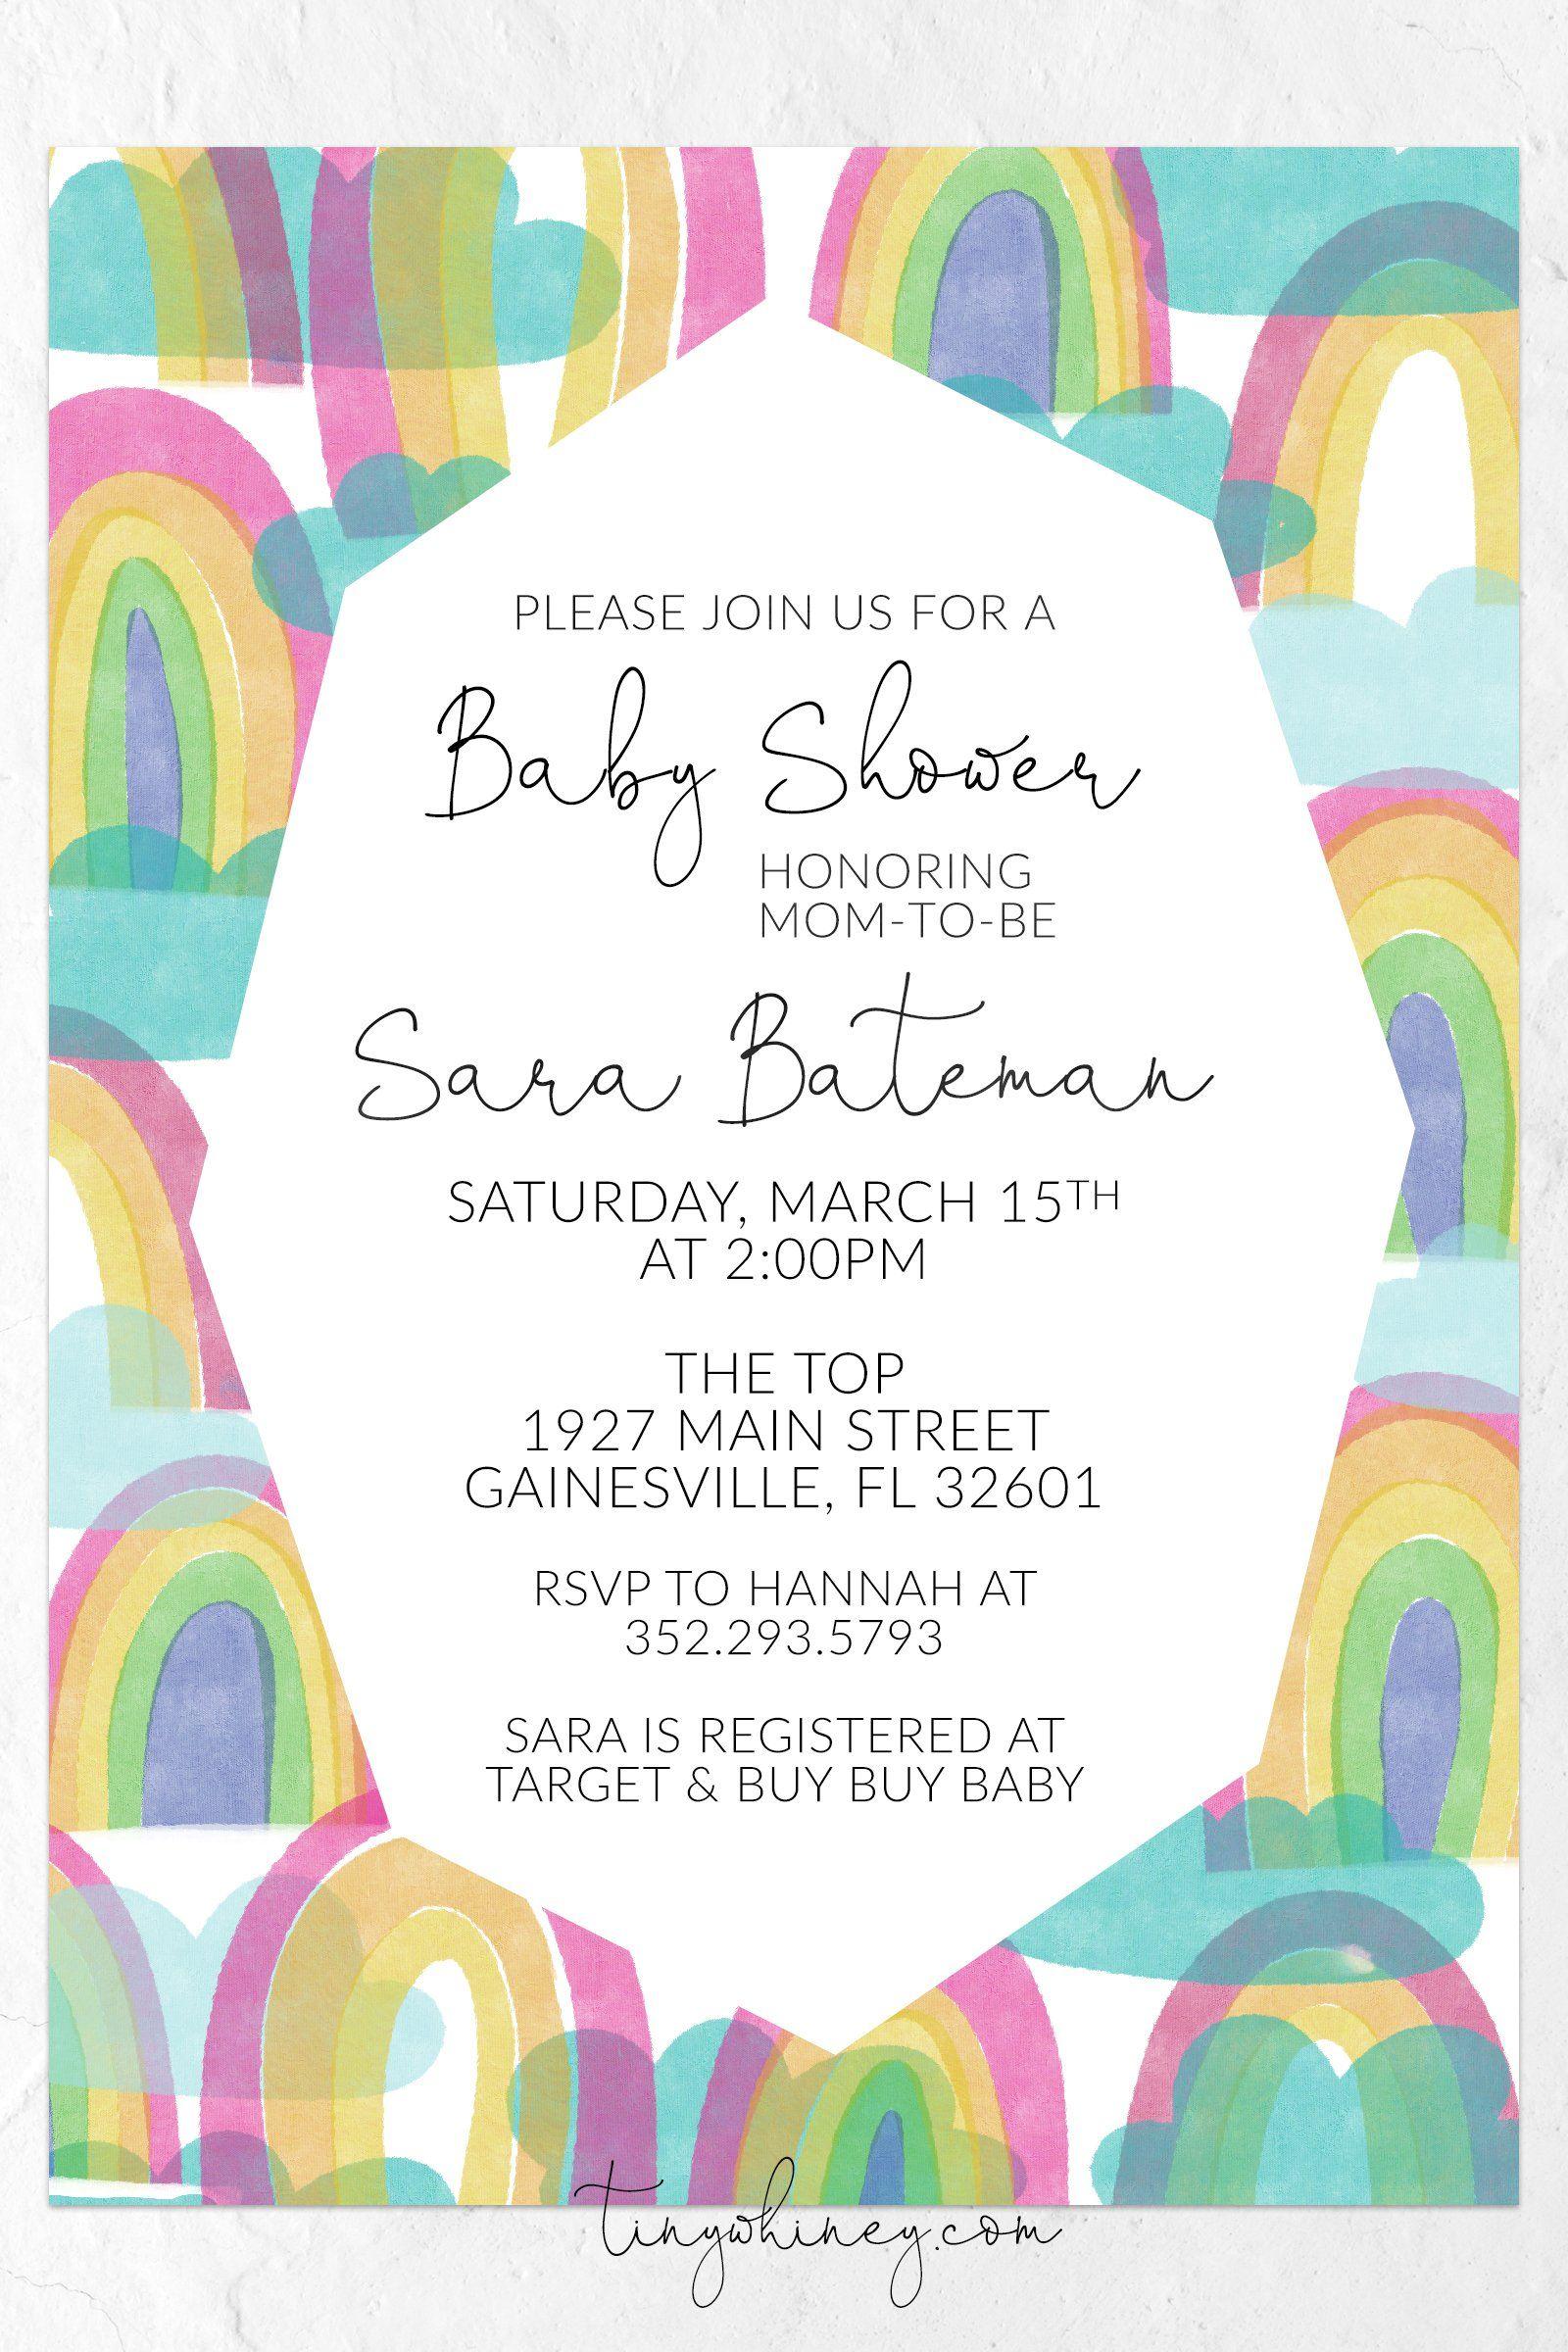 Rainbow Baby Shower Invitation Printable Invitations Celebrating A New Baby Rainbow Baby Shower Invitations Rainbow Baby Shower Baby Shower Invitations